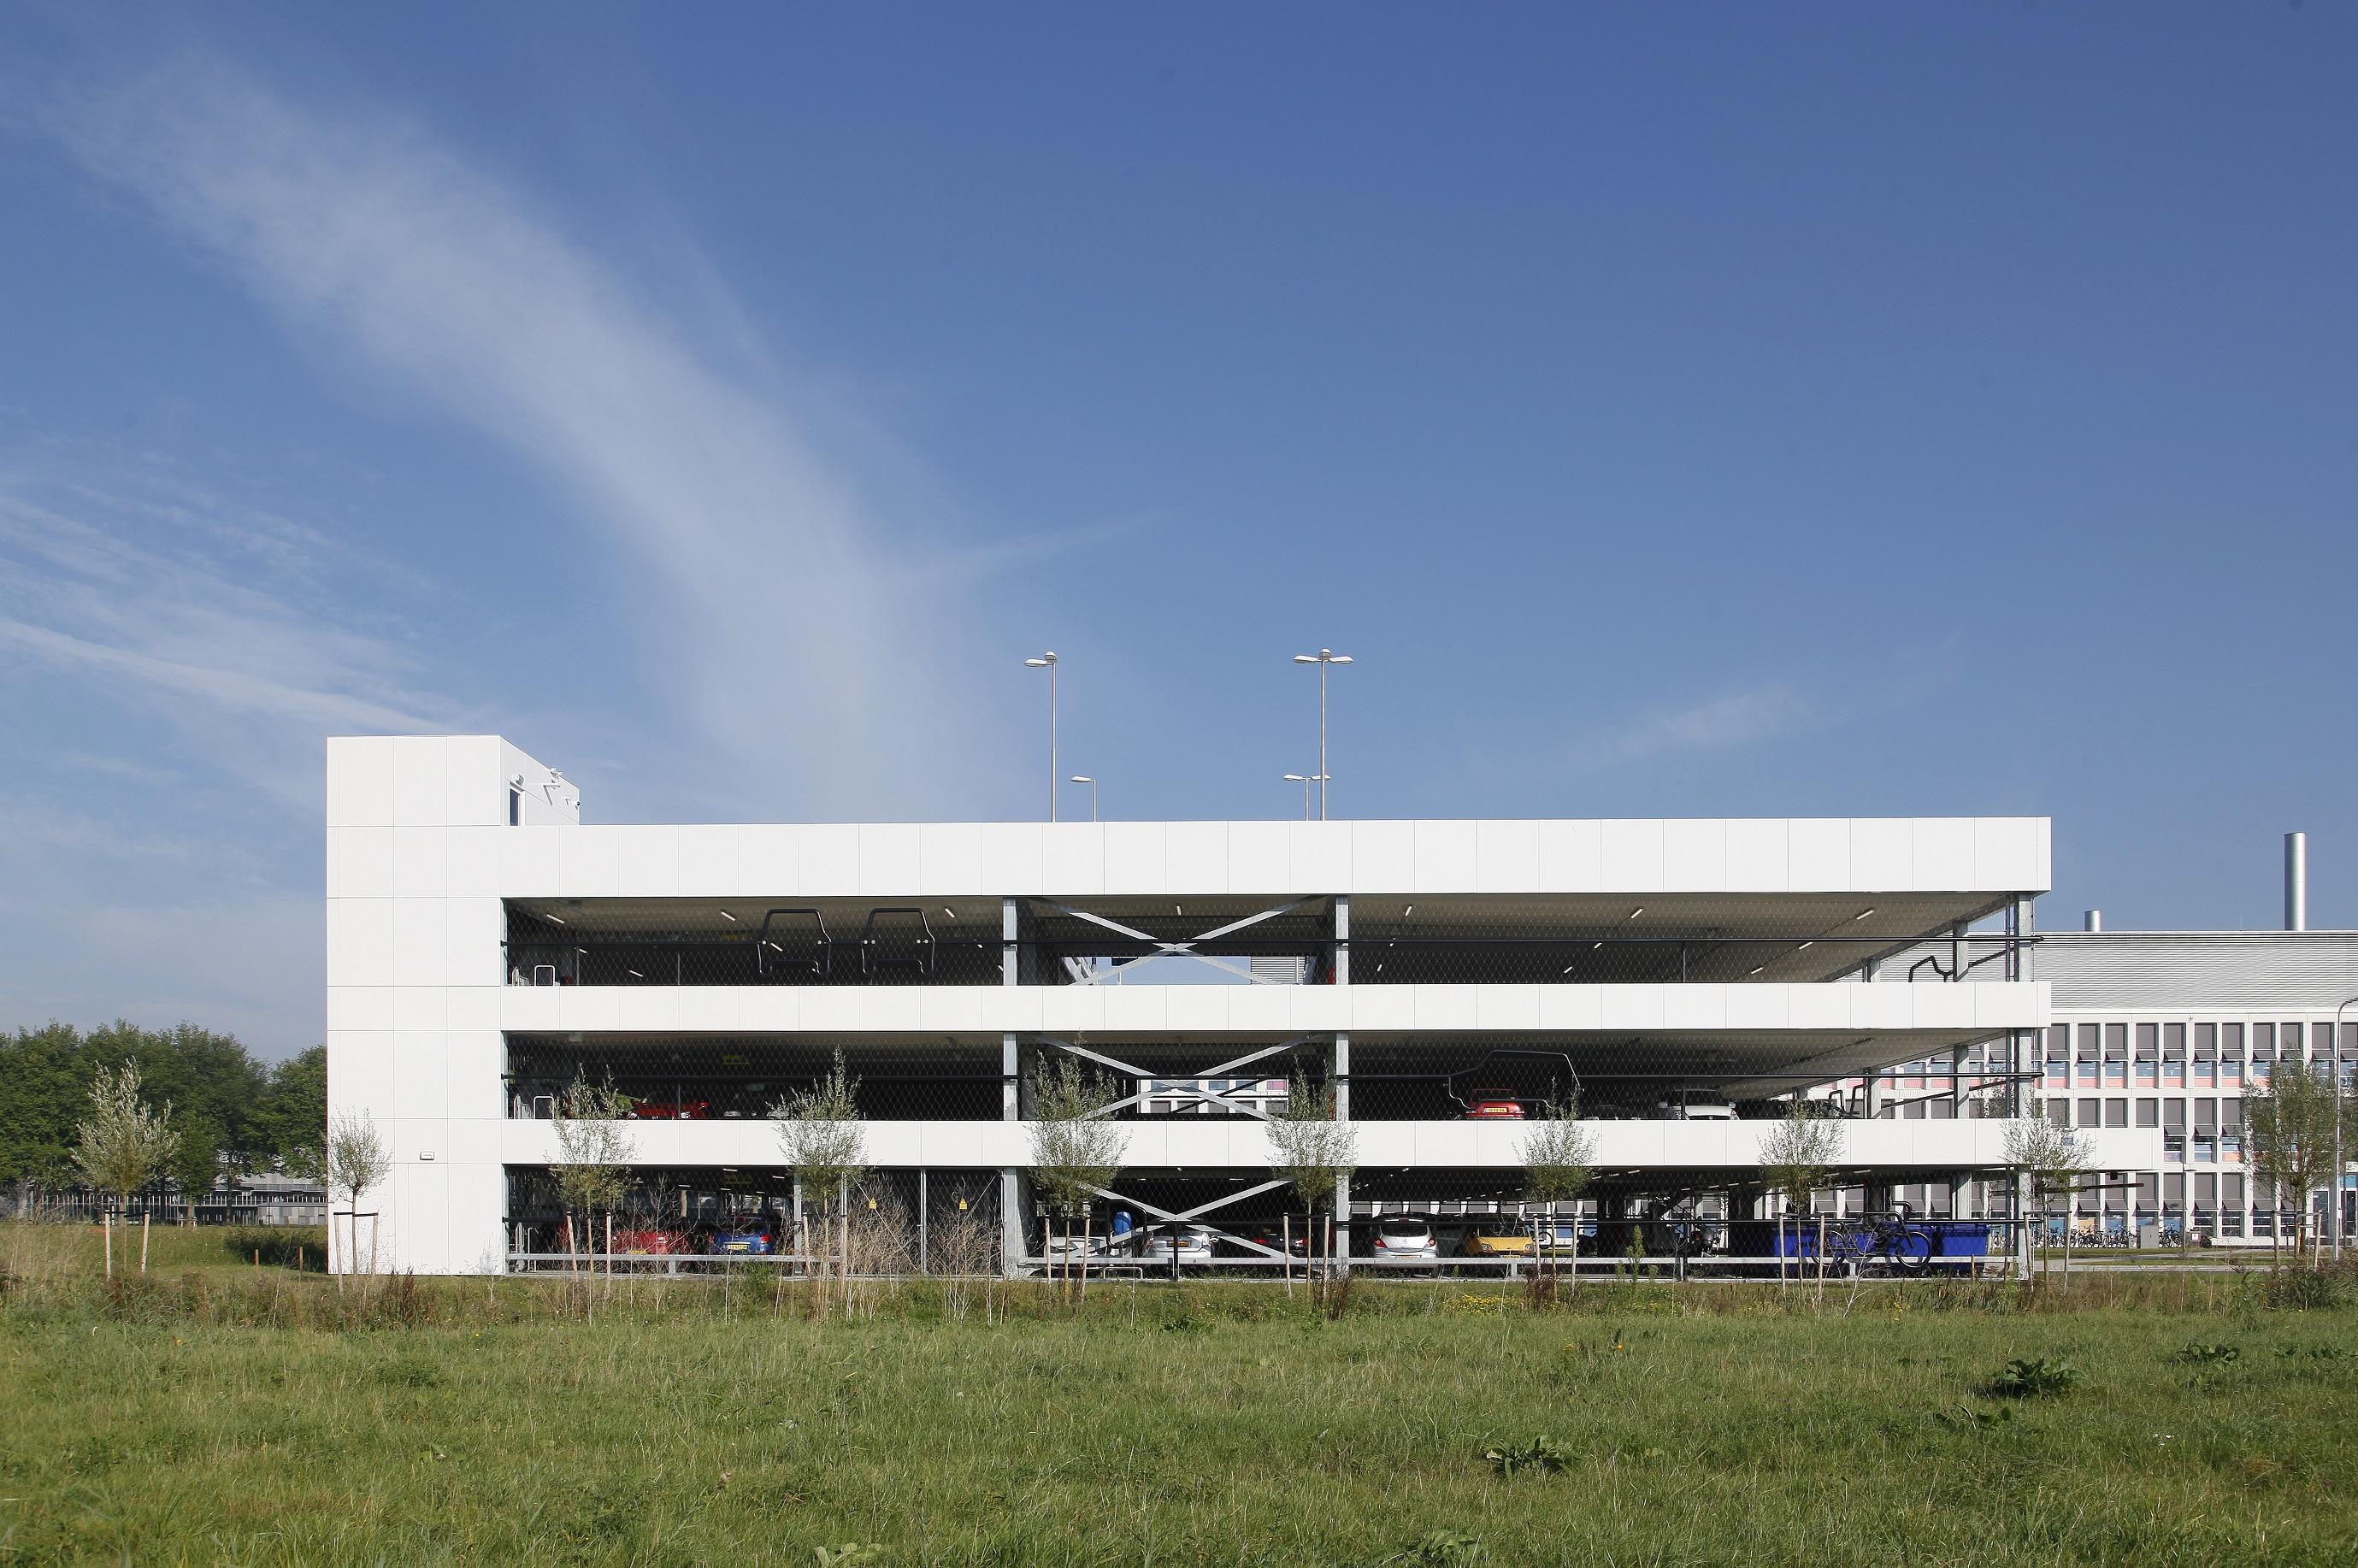 Technische Universiteit Delft